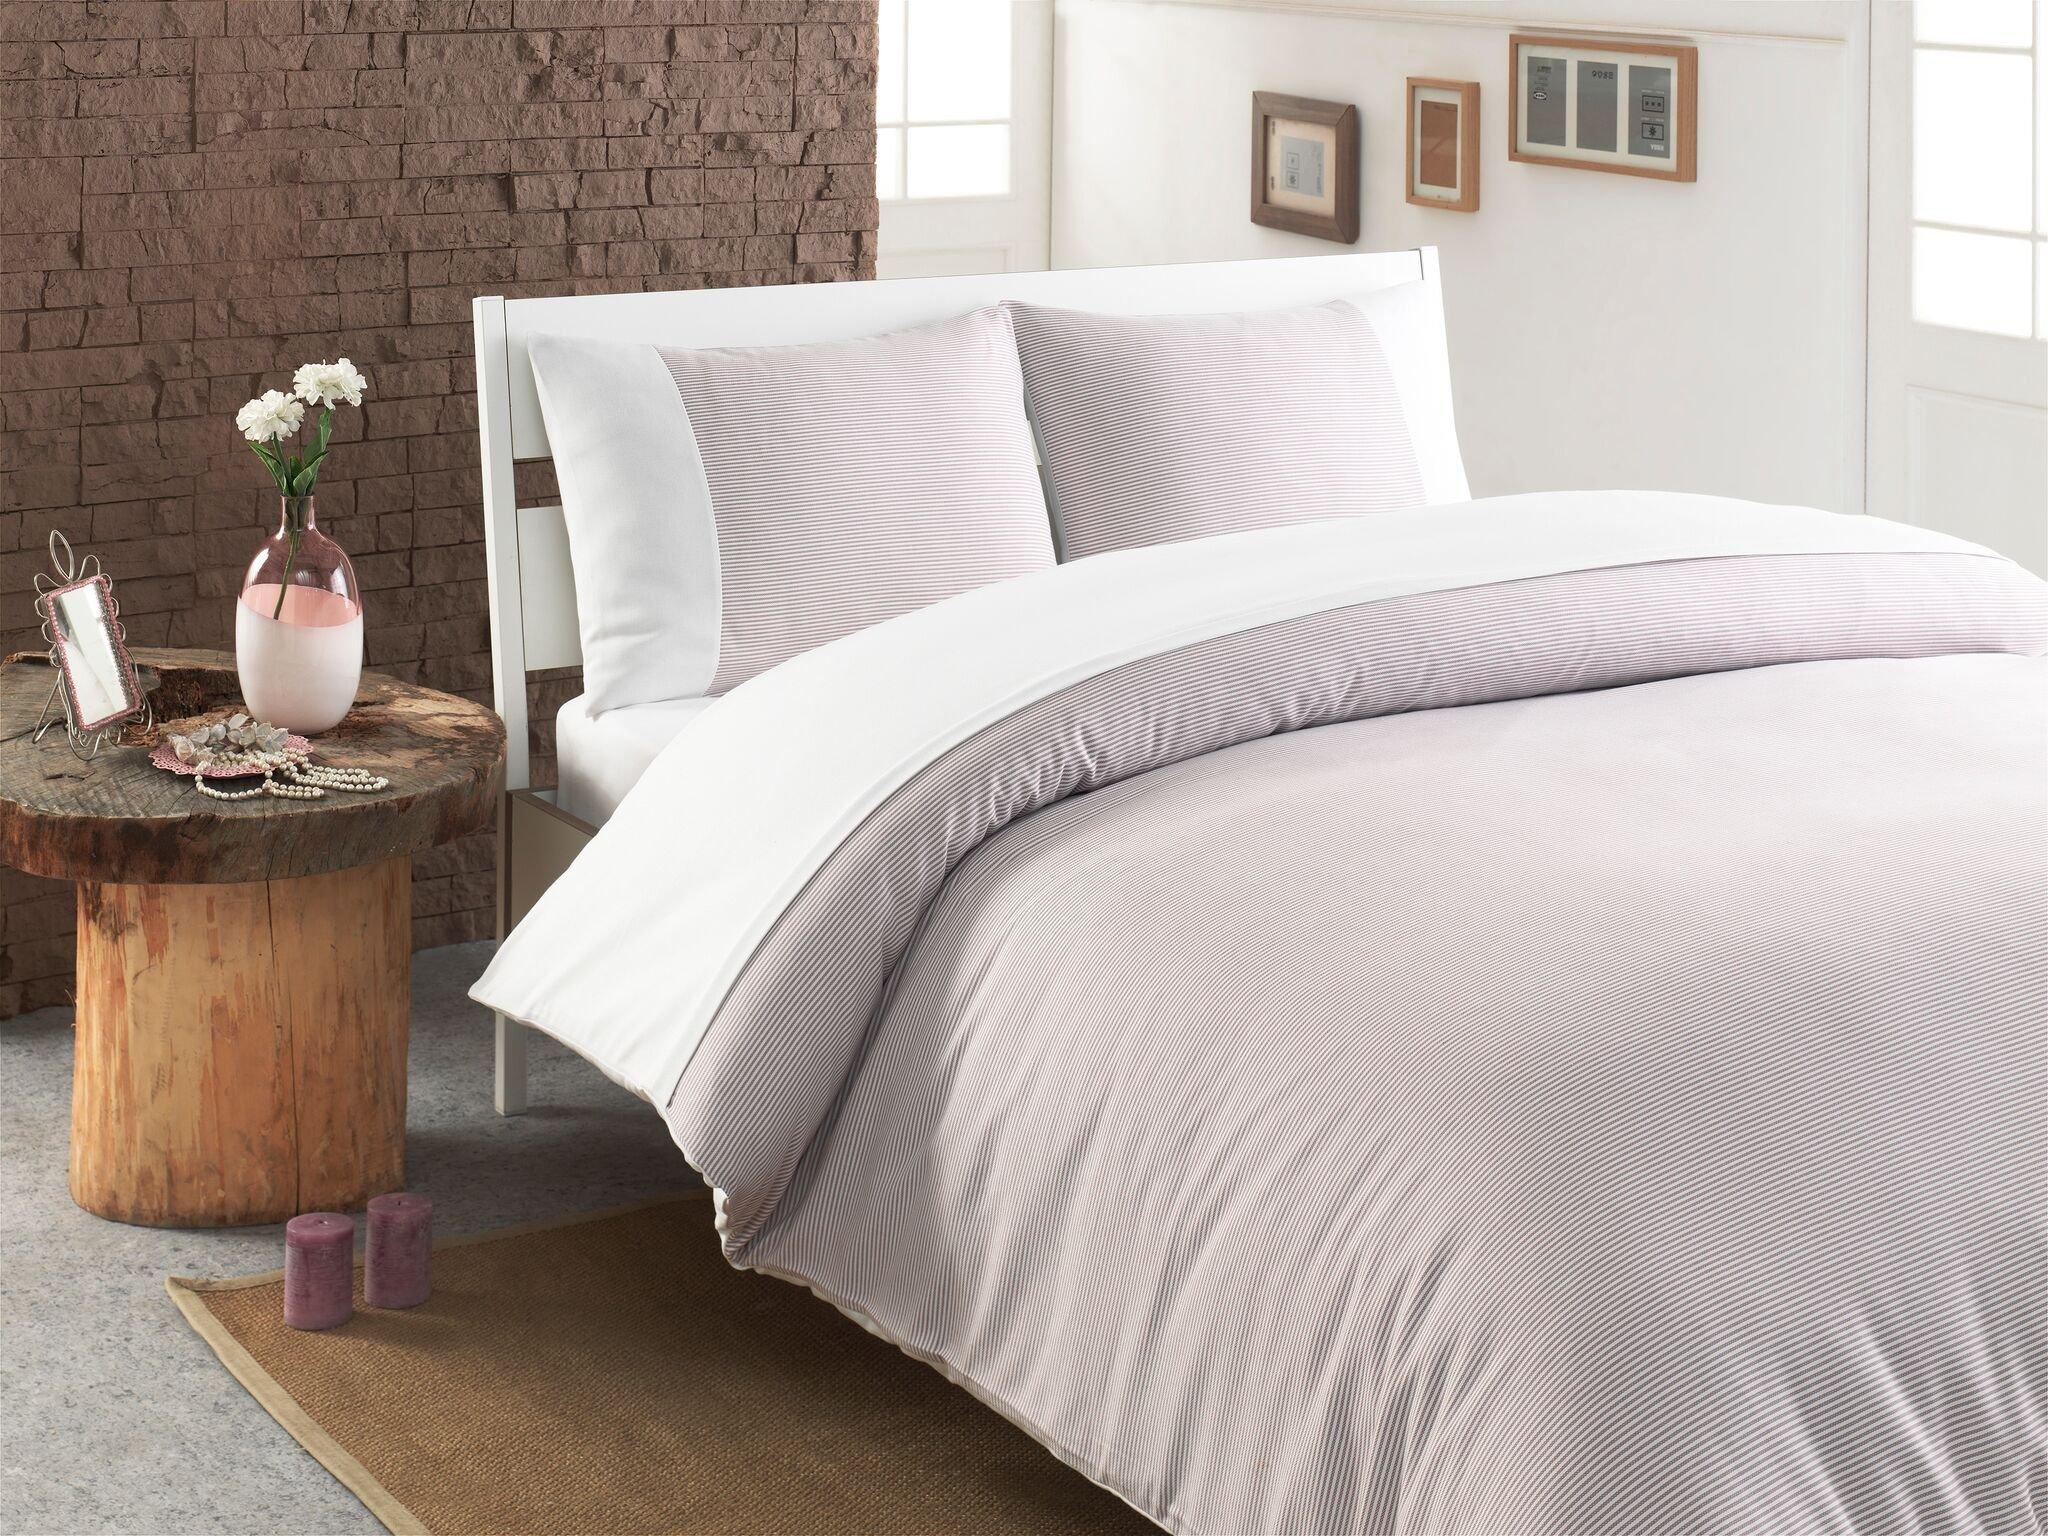 Linum Home Textiles Chevas Luxury Stripe Premium Authentic Soft 100% Turkish Cotton Luxury Duvet Cover, King, White/Taupe Pencil Stripes